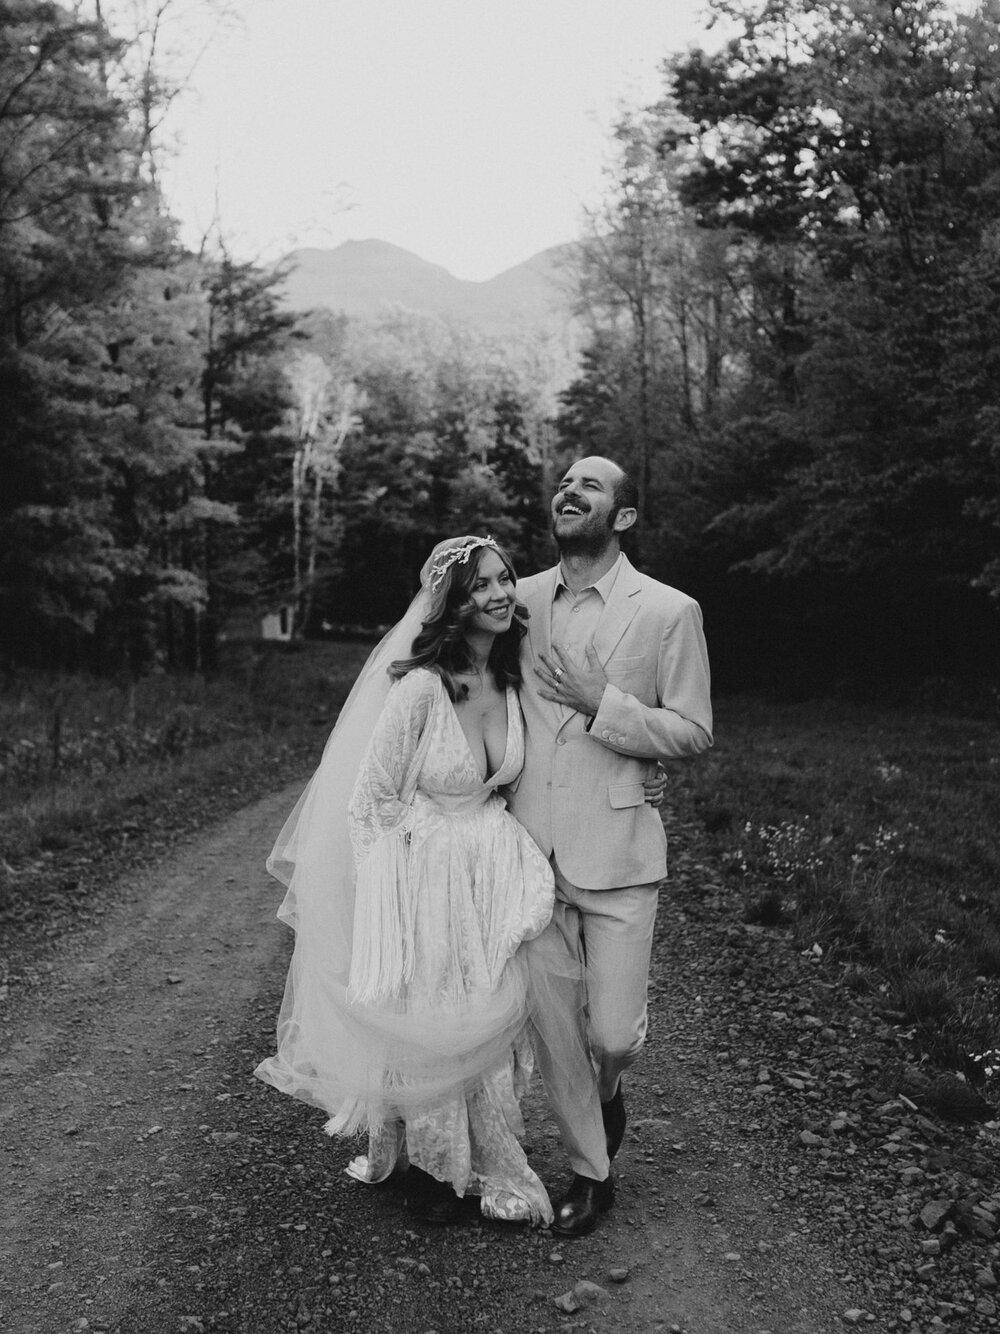 Deer_Mountain_Inn_Wedding_Chellise_Michael_Photography-3.jpg